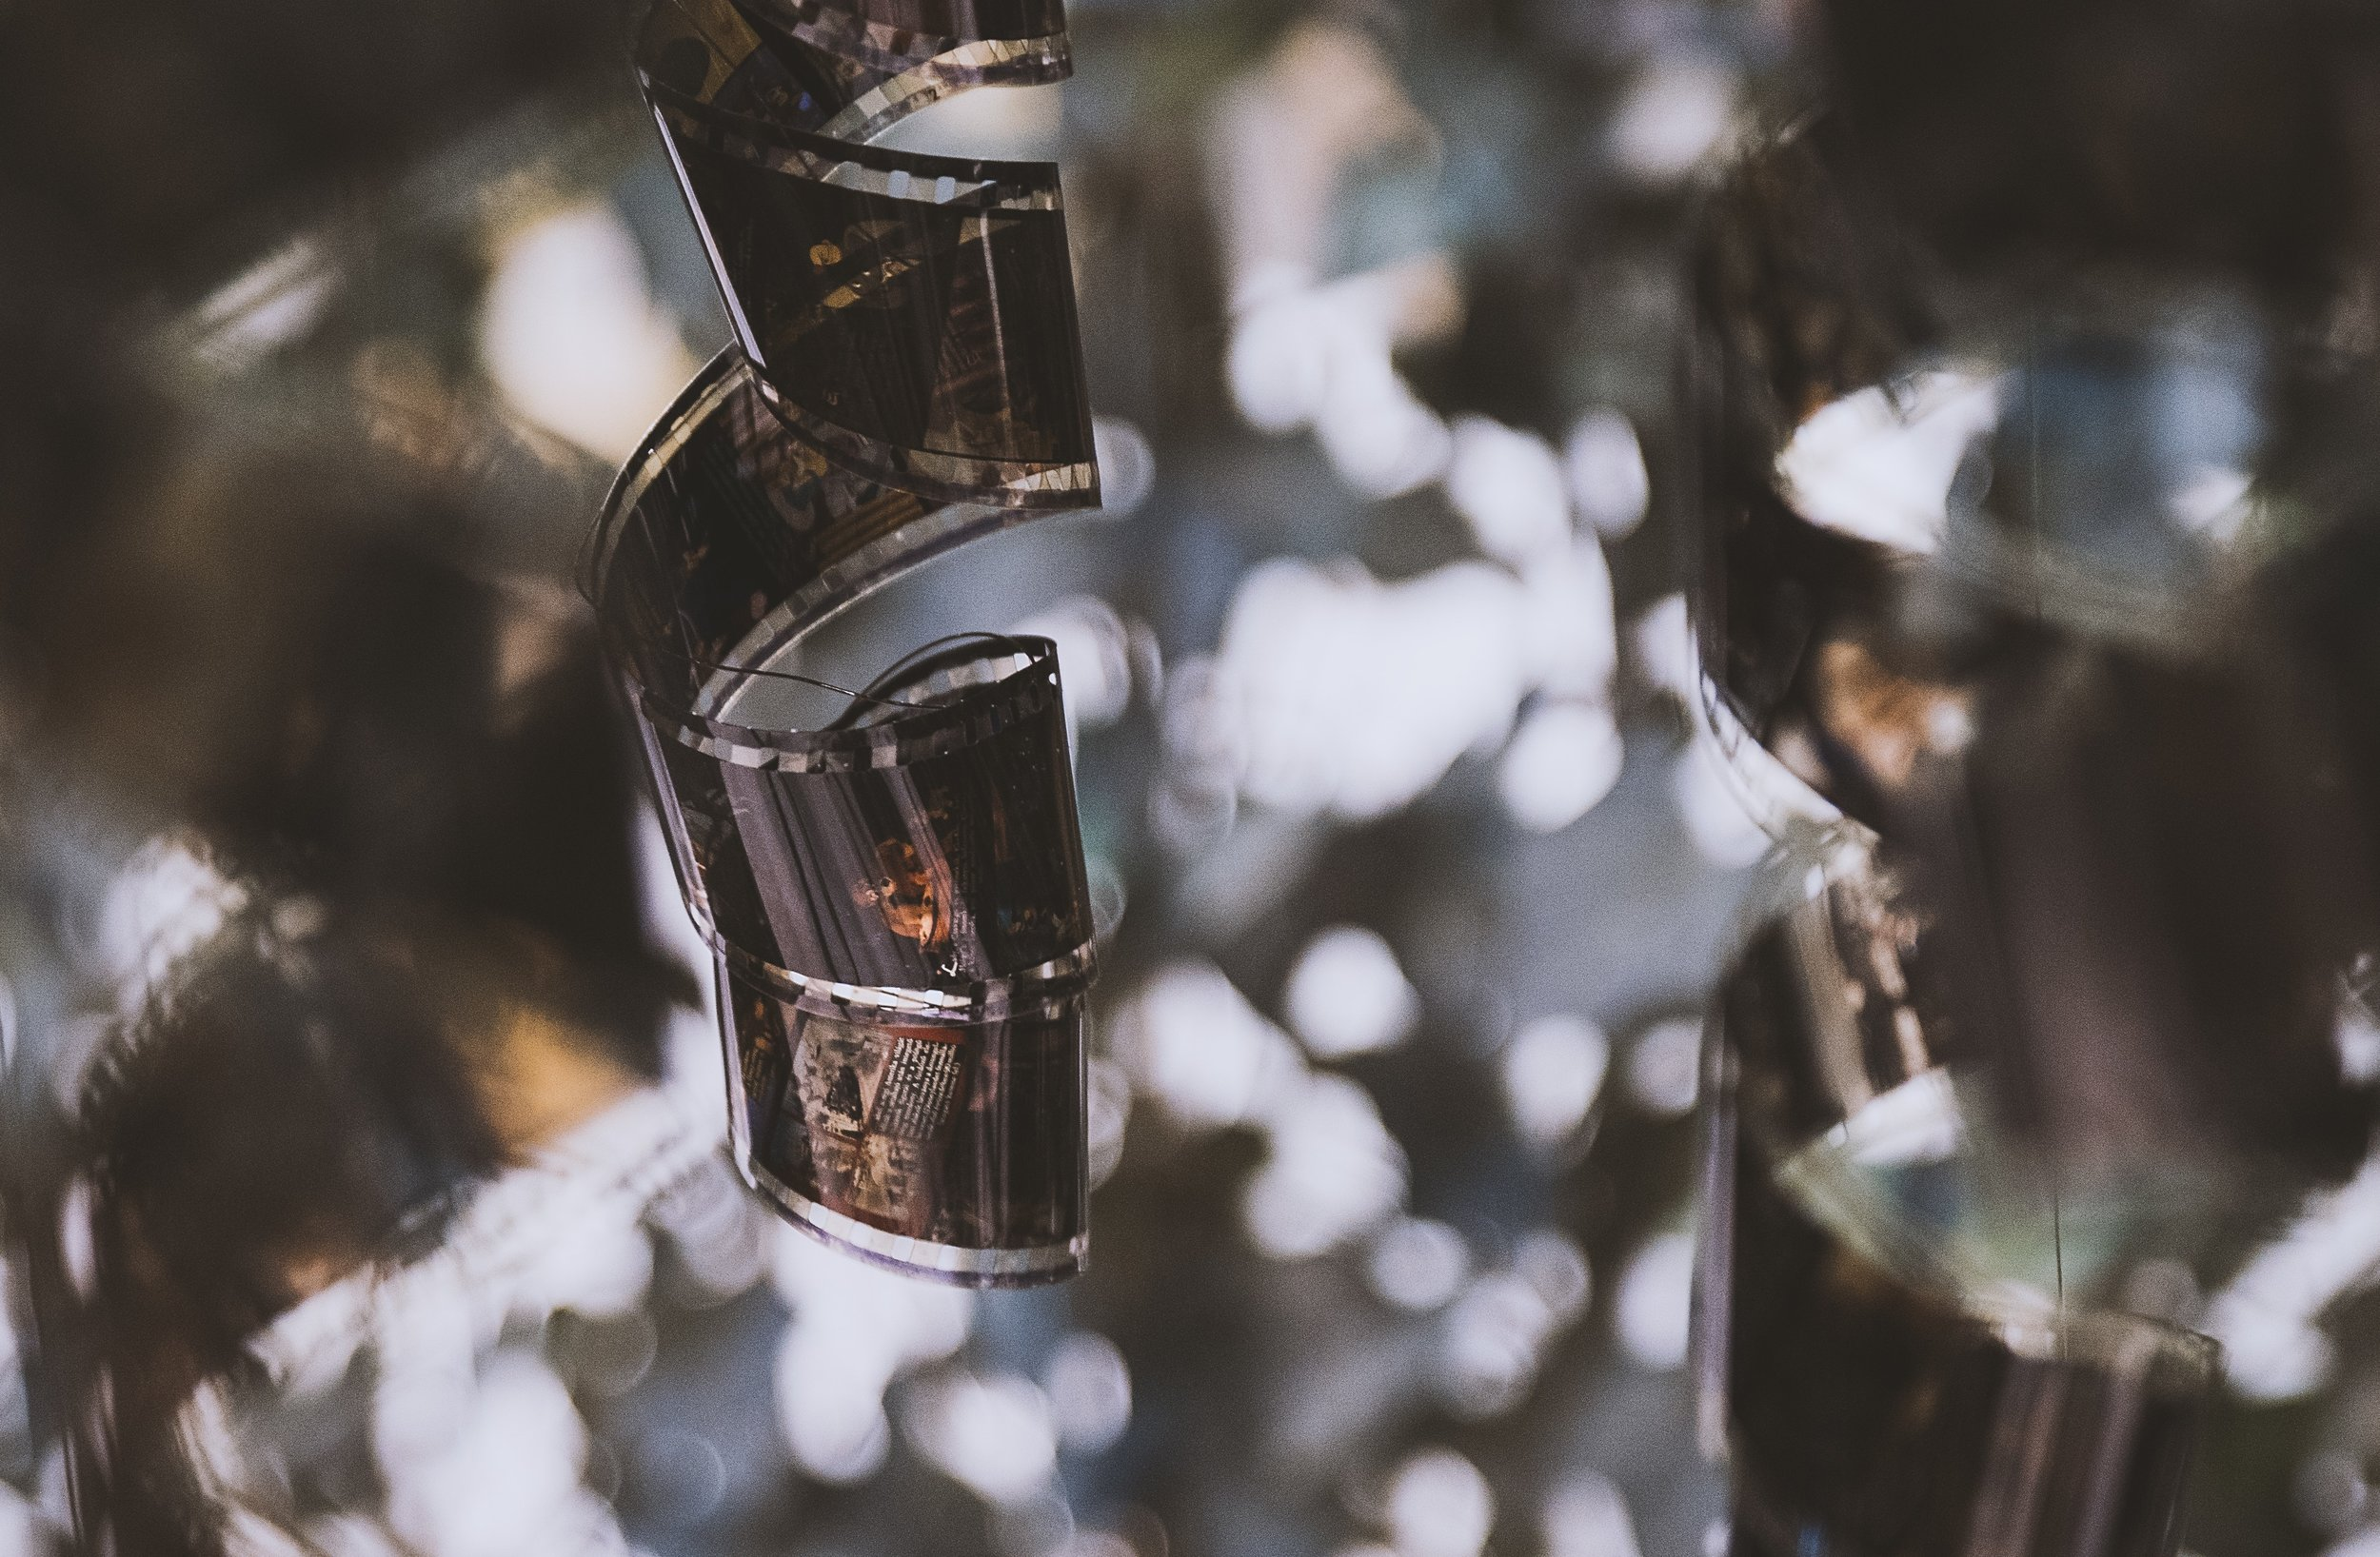 black-black-background-blur-714926.jpg